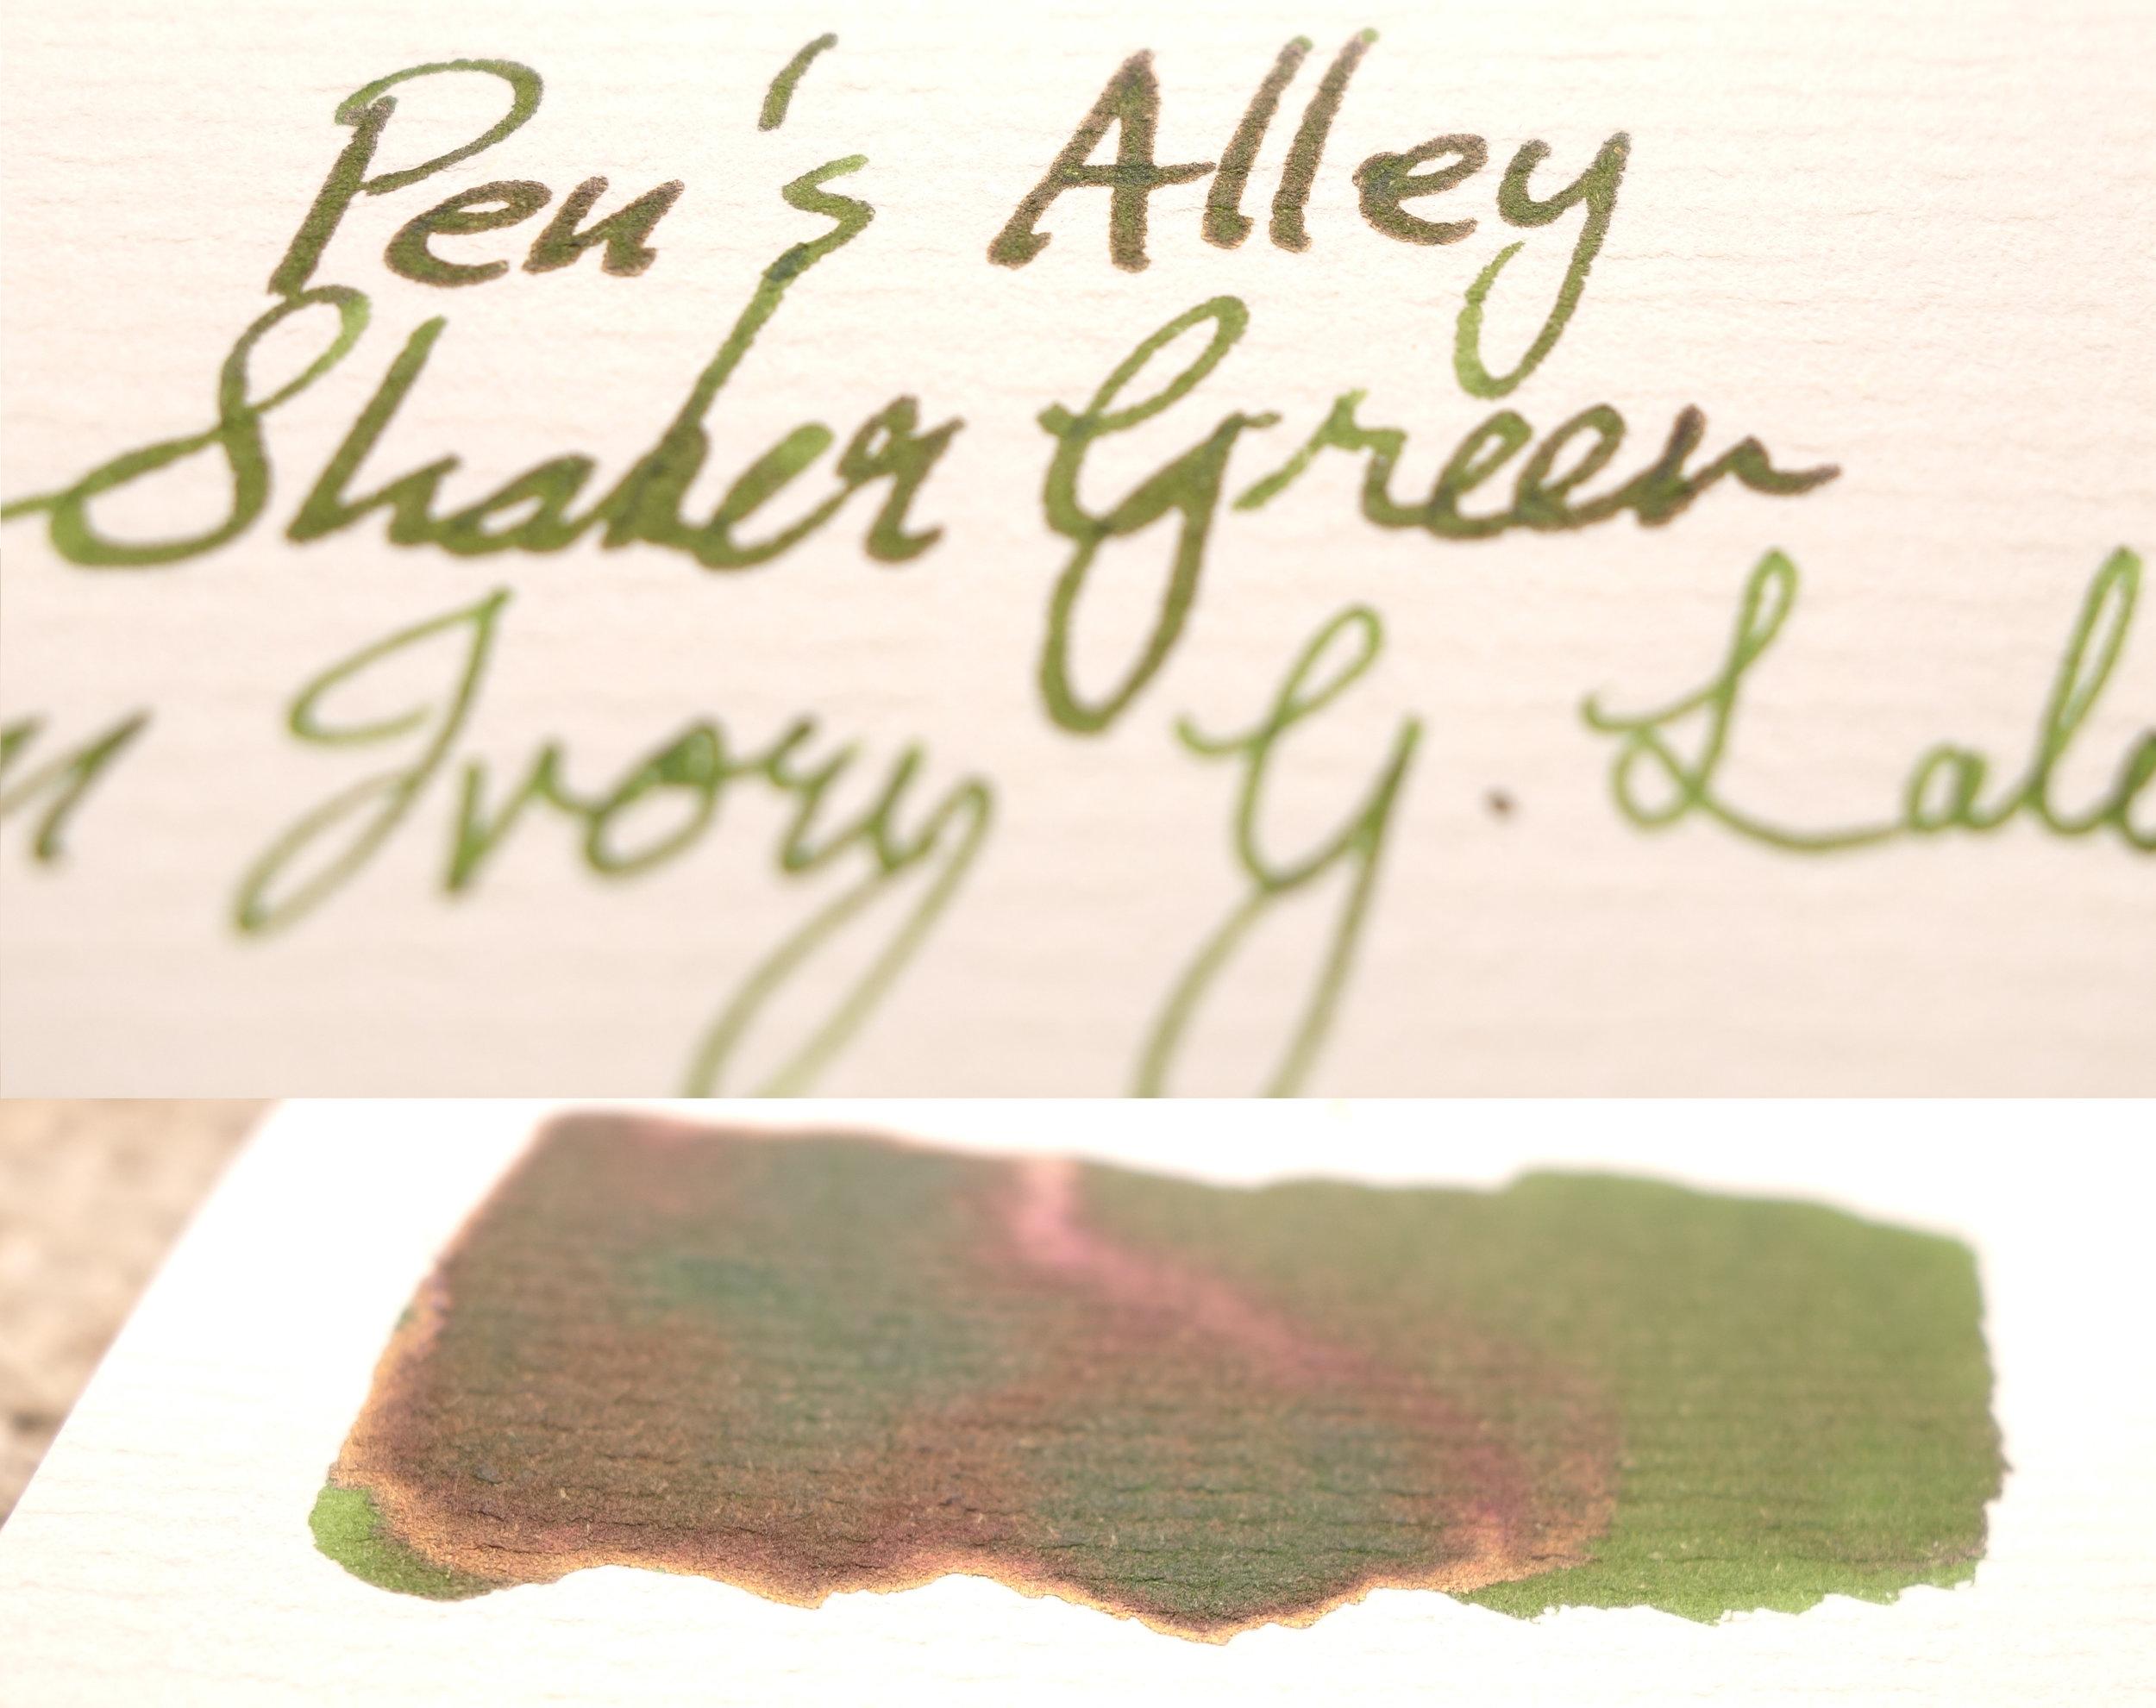 Sheen Ivory G. Lalo